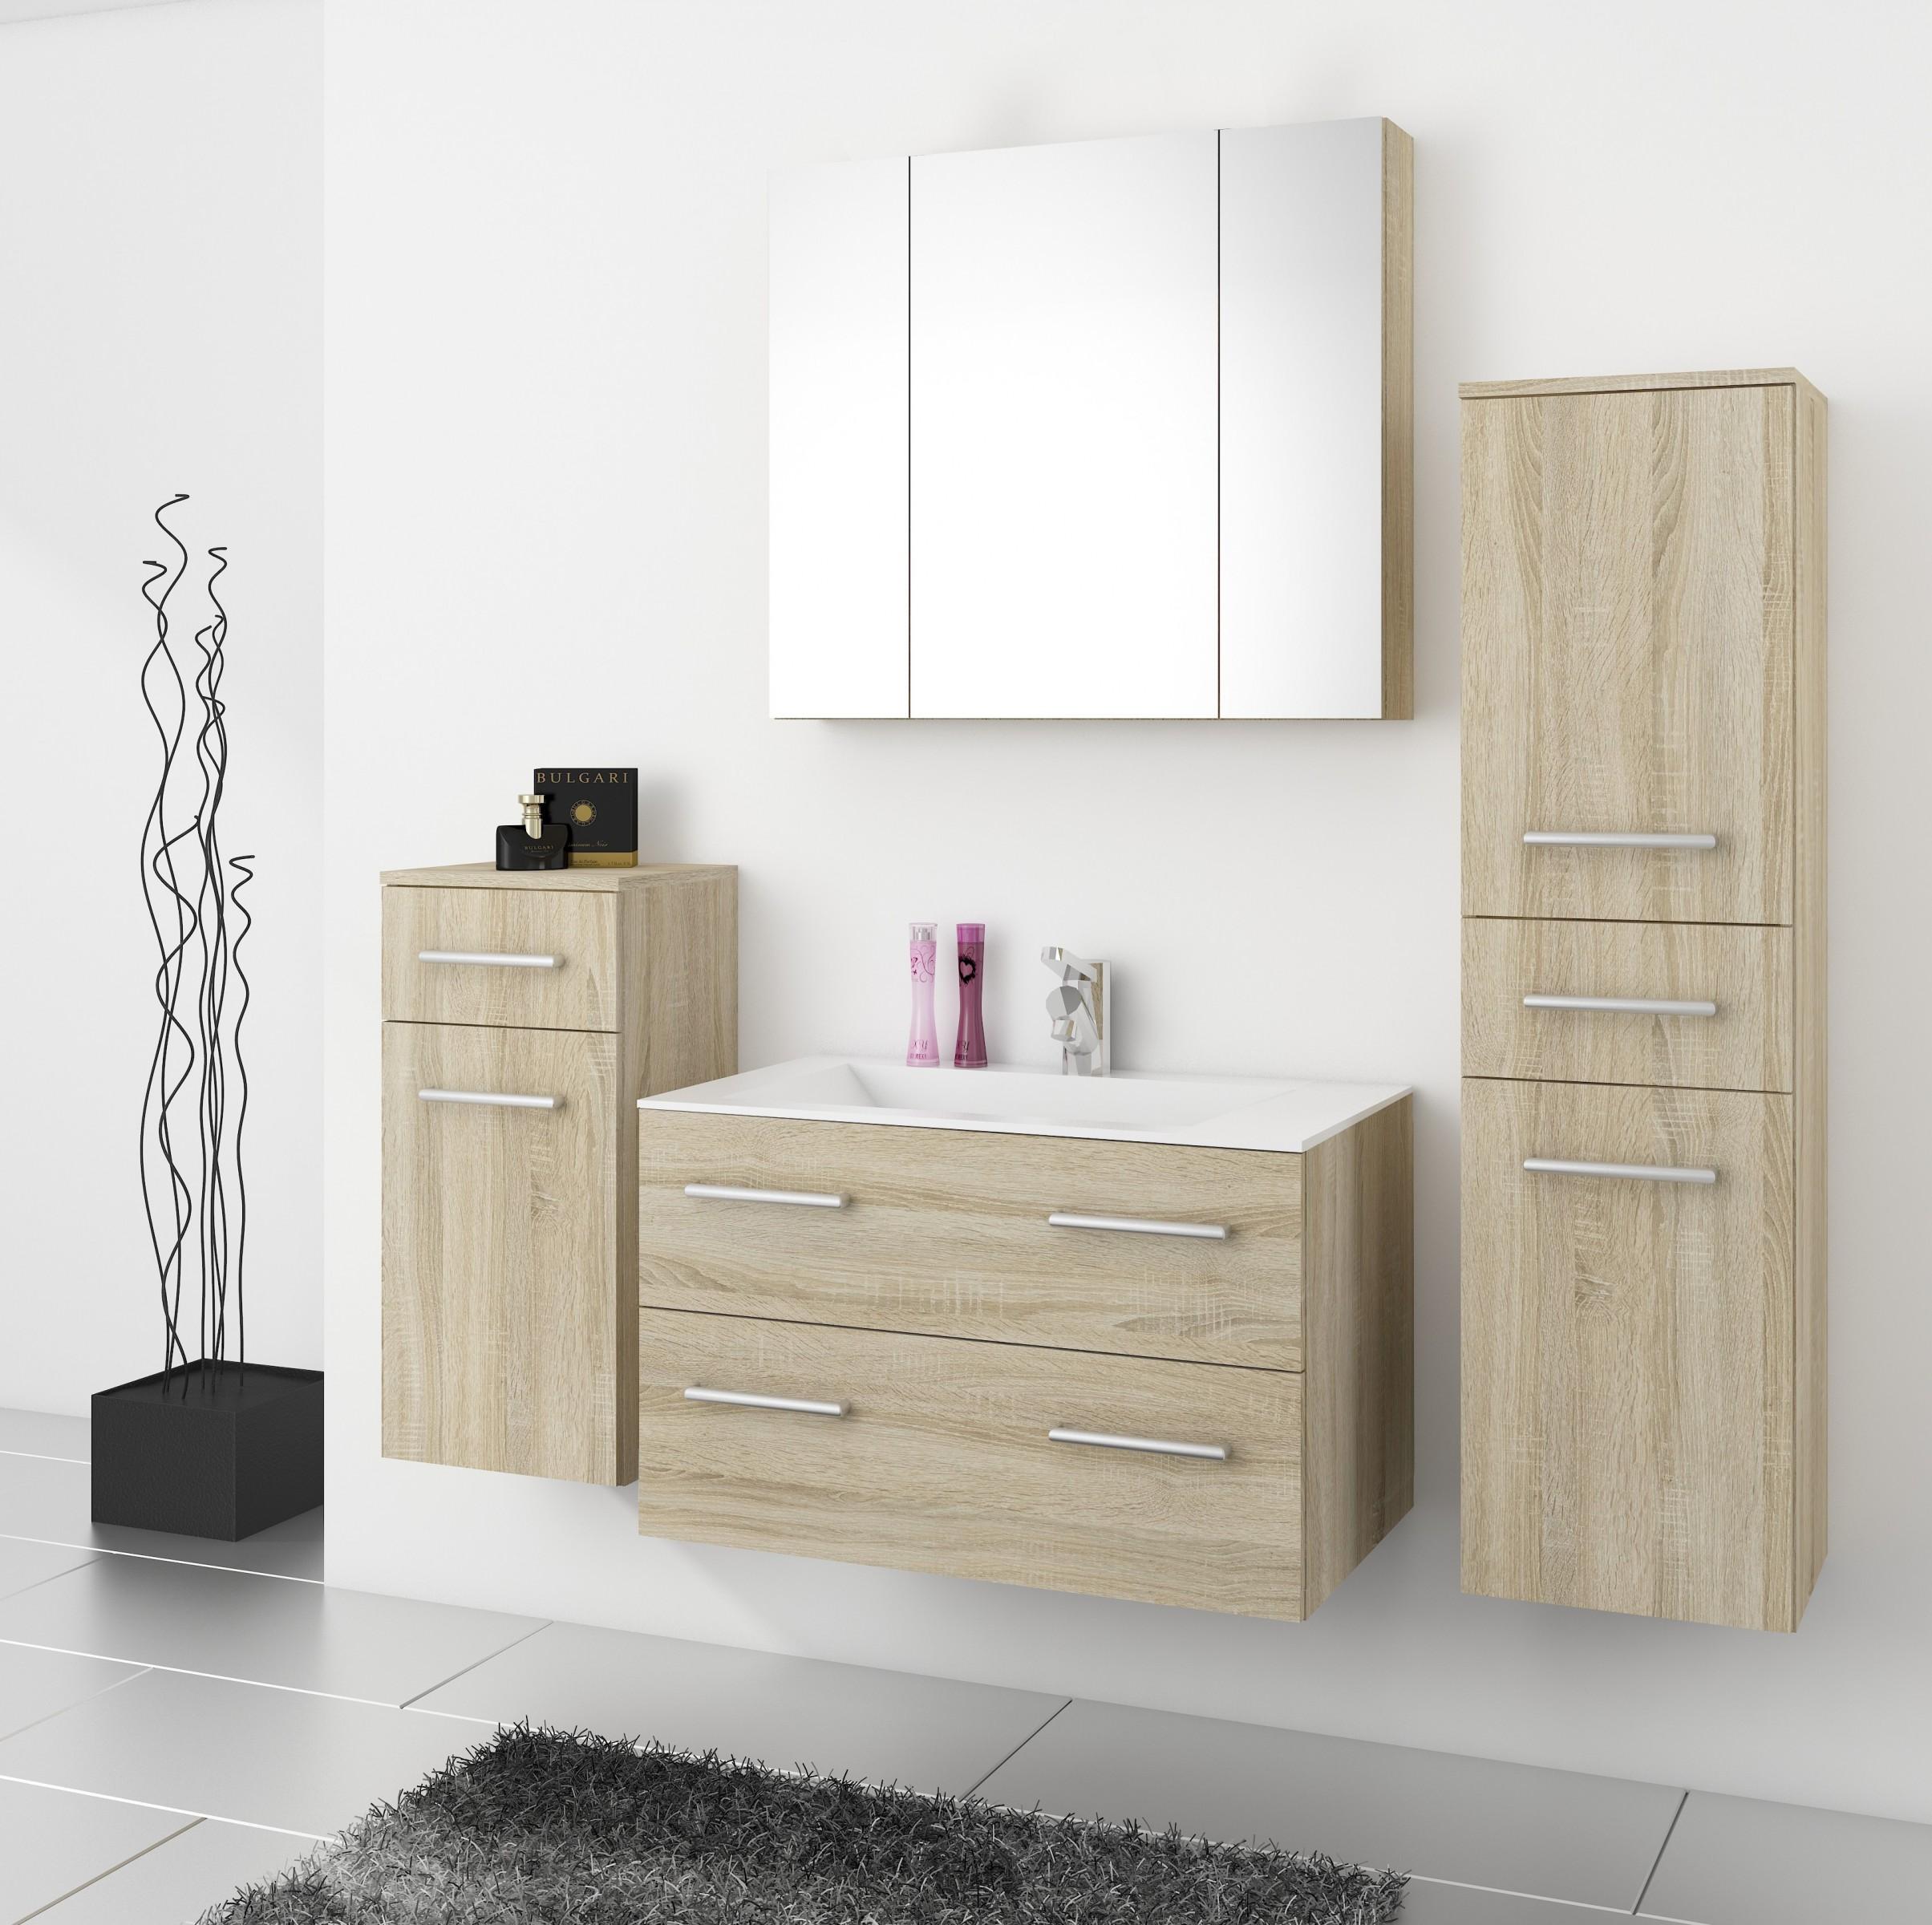 Top badm bel badezimmer regina 5tlg set in sonoma eiche for Badezimmer set gunstig